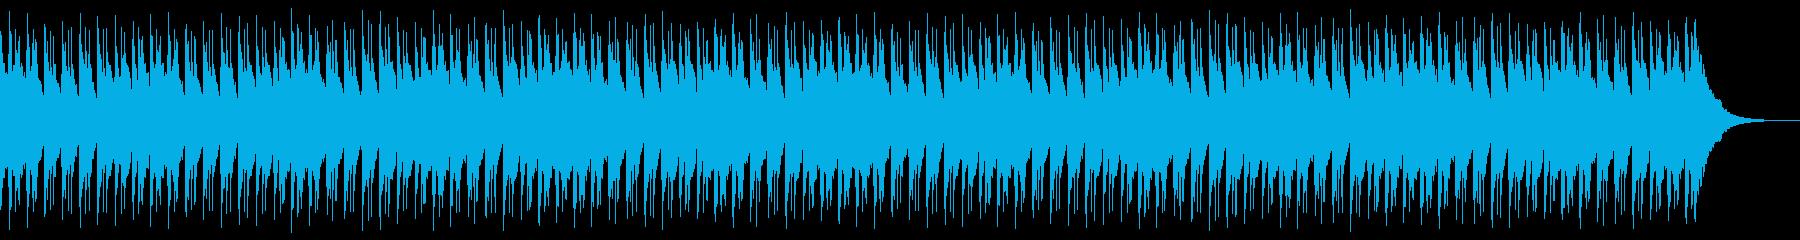 Happy Ukulele 11の再生済みの波形